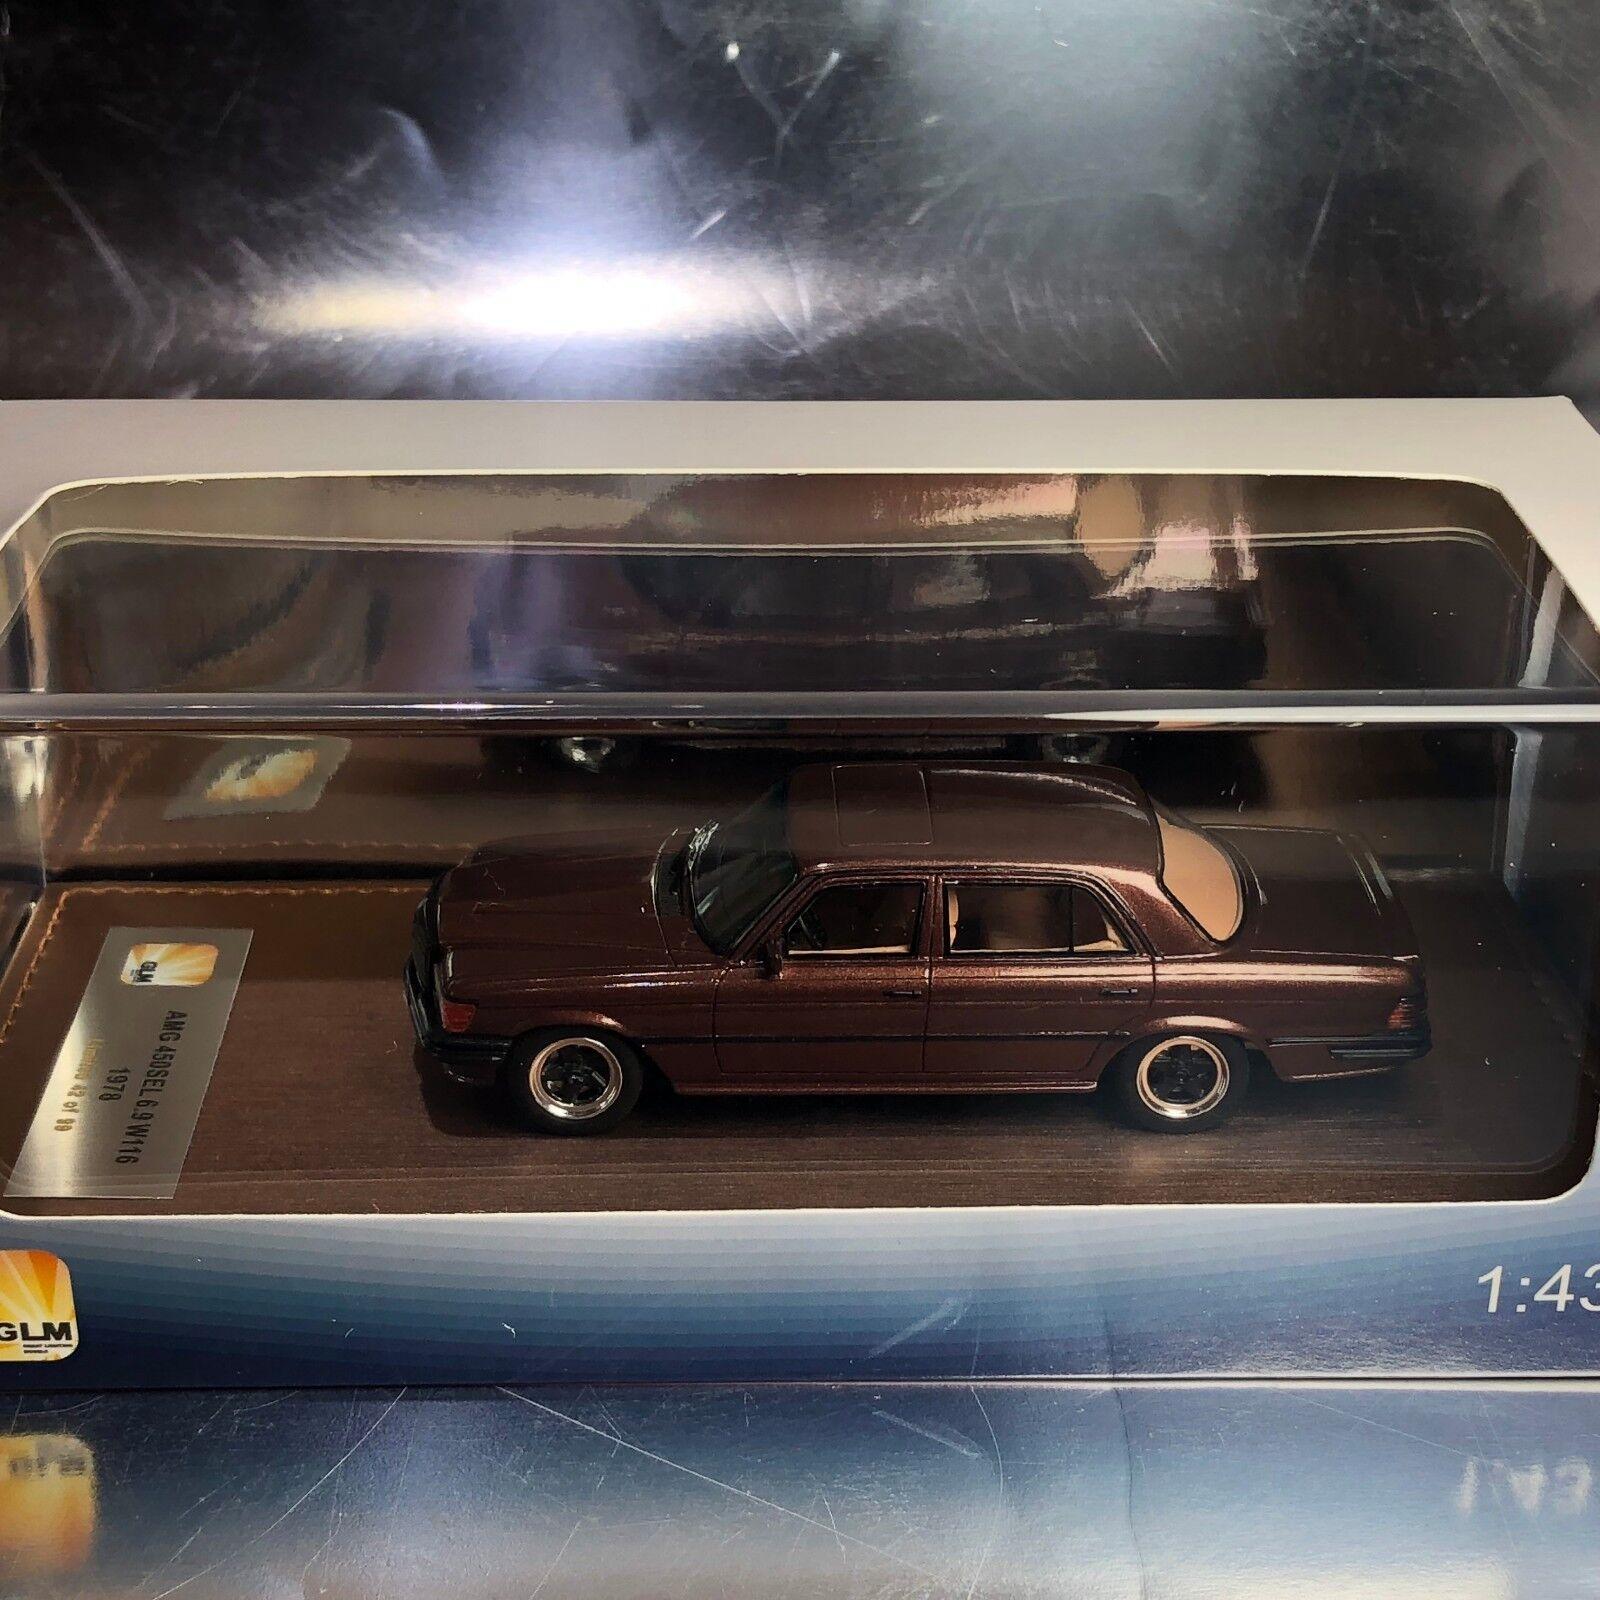 1/43 Modelo GLM206002 Mercedes AMG GLM 450SEL W116 2018 Marrón Metálico